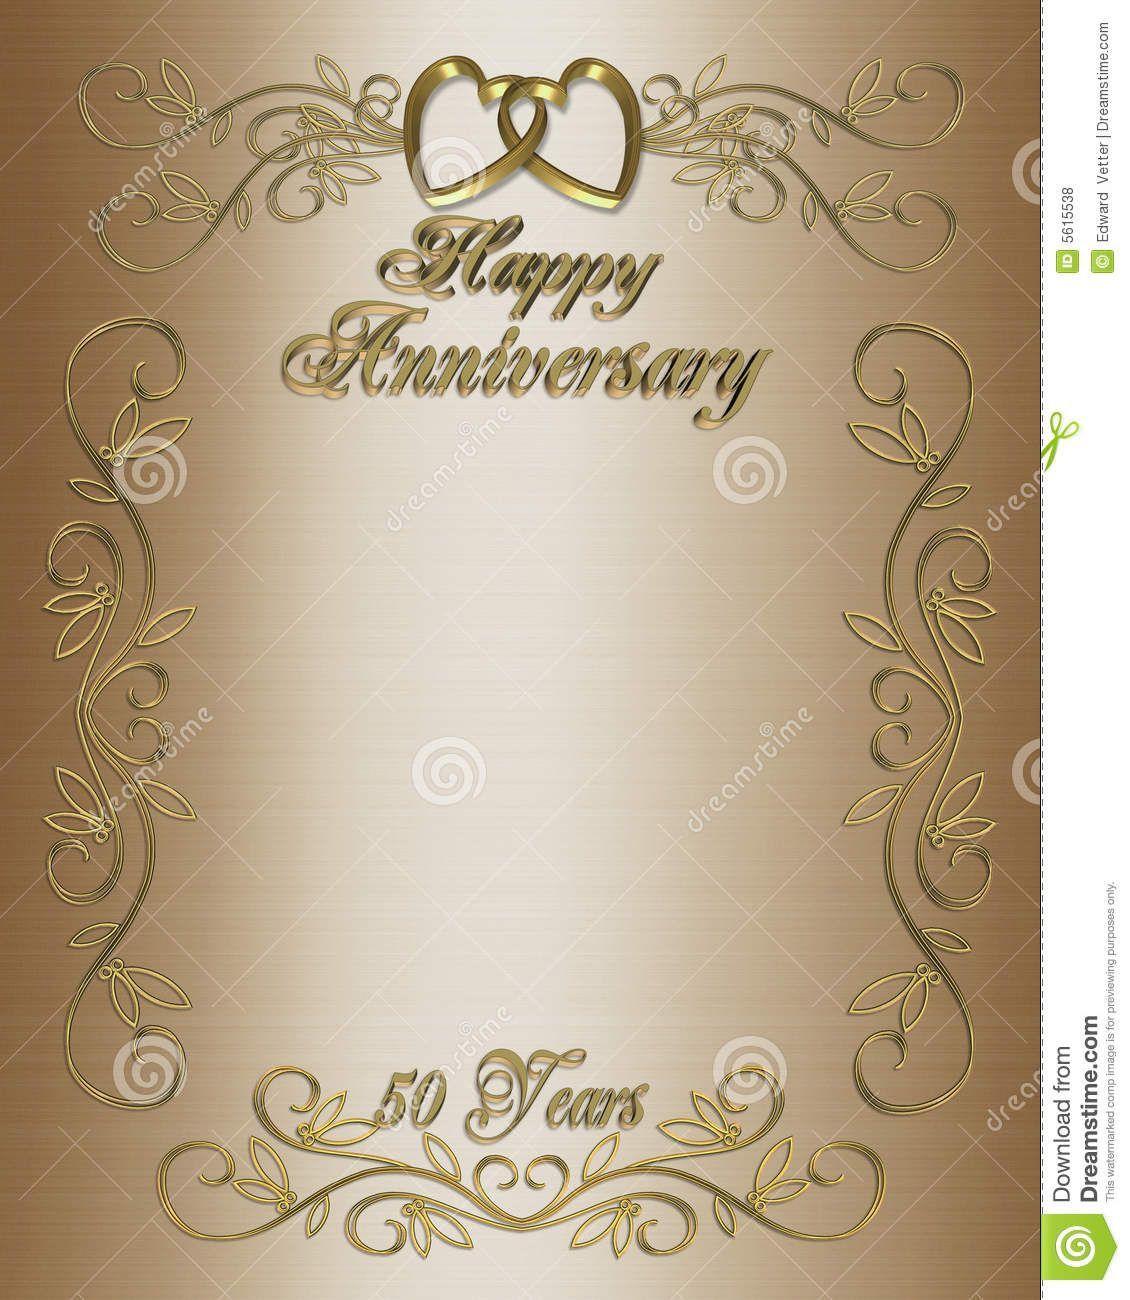 005 Fantastic 50th Wedding Anniversary Invitation Template Free Download Idea  GoldenFull